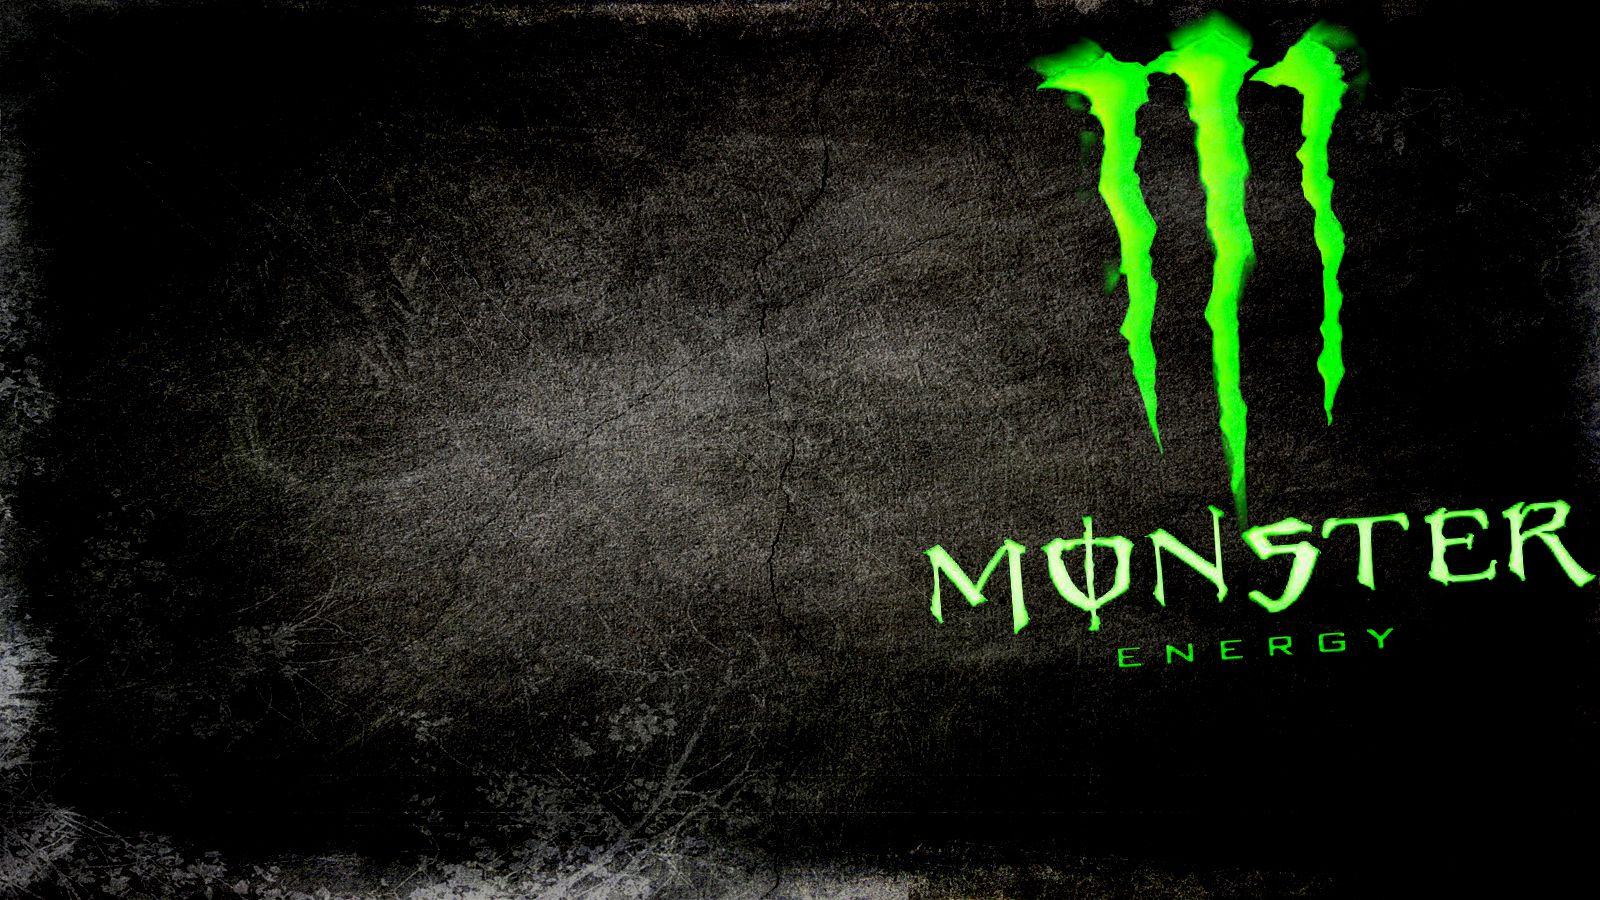 Tags bebida energy energtica monster energy 1600x900